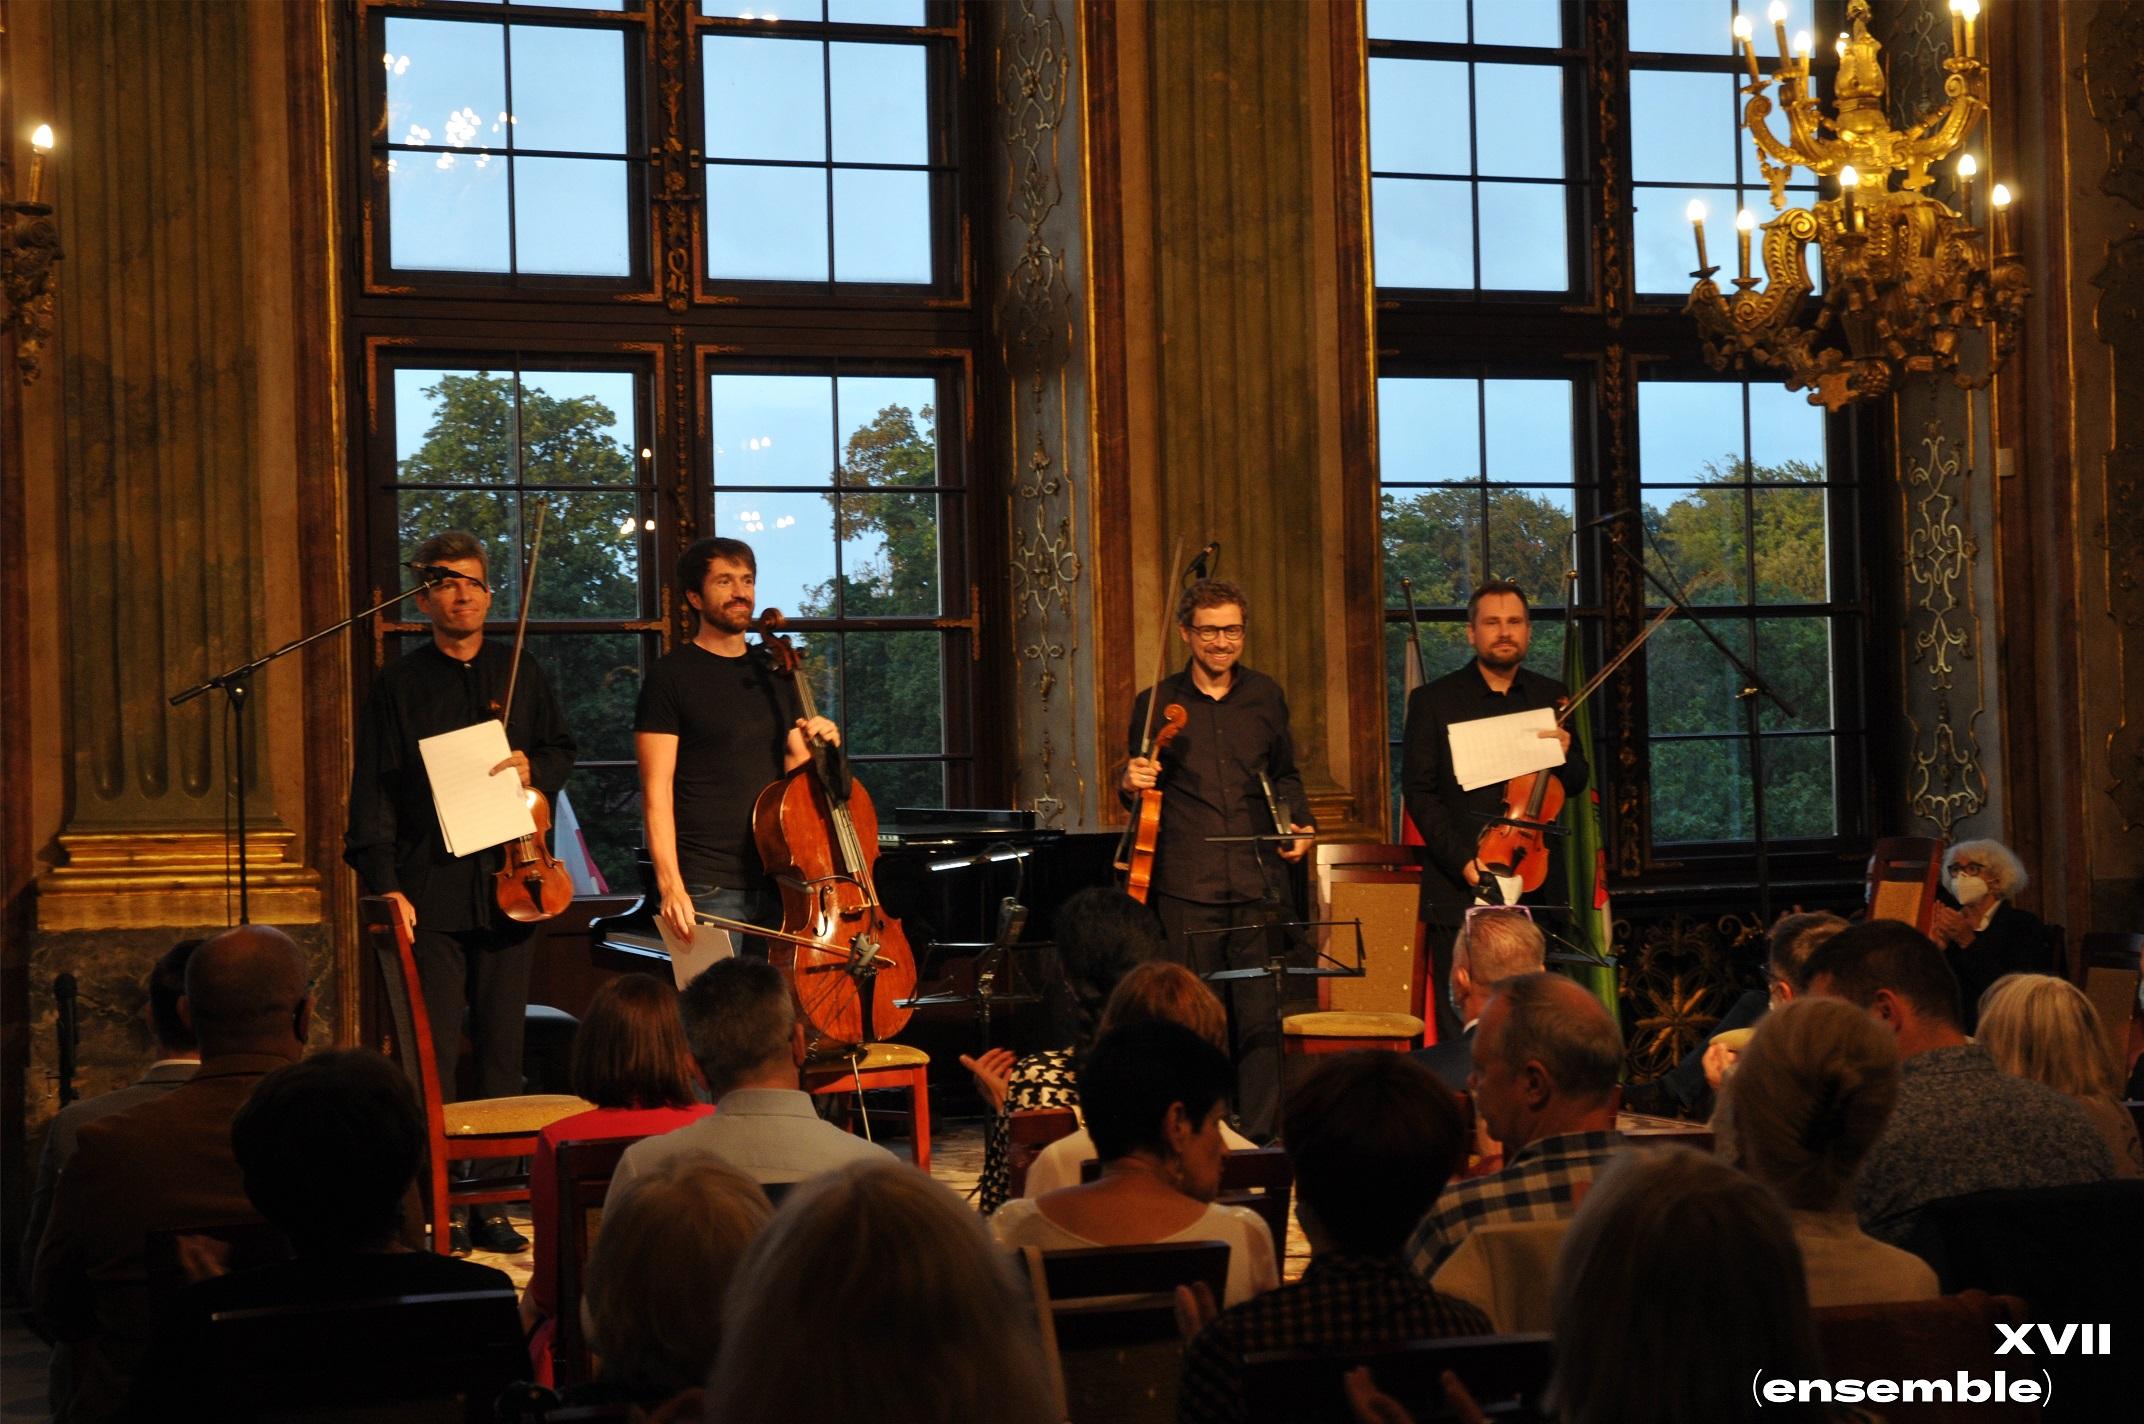 Kolejna edycja Festiwalu Ensemble